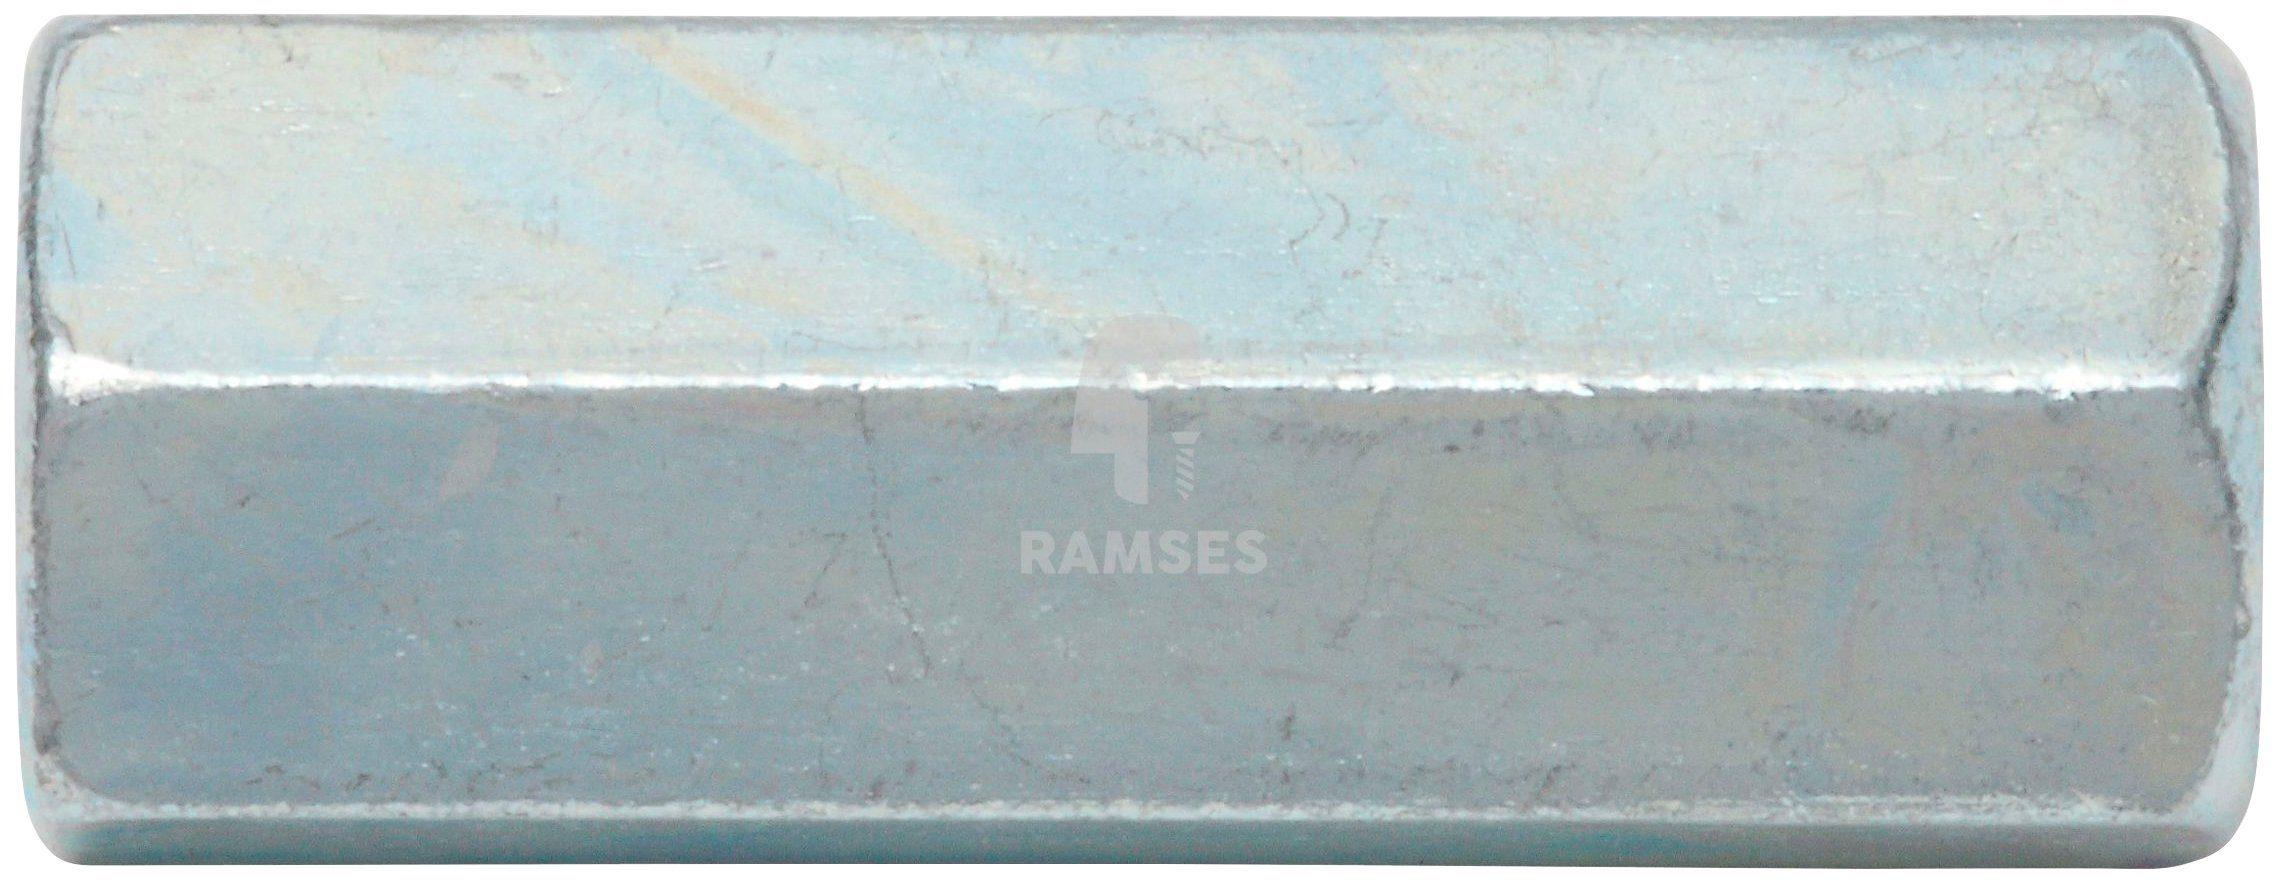 RAMSES Muffe , Sechskant Gewindemuffe M16 X 50